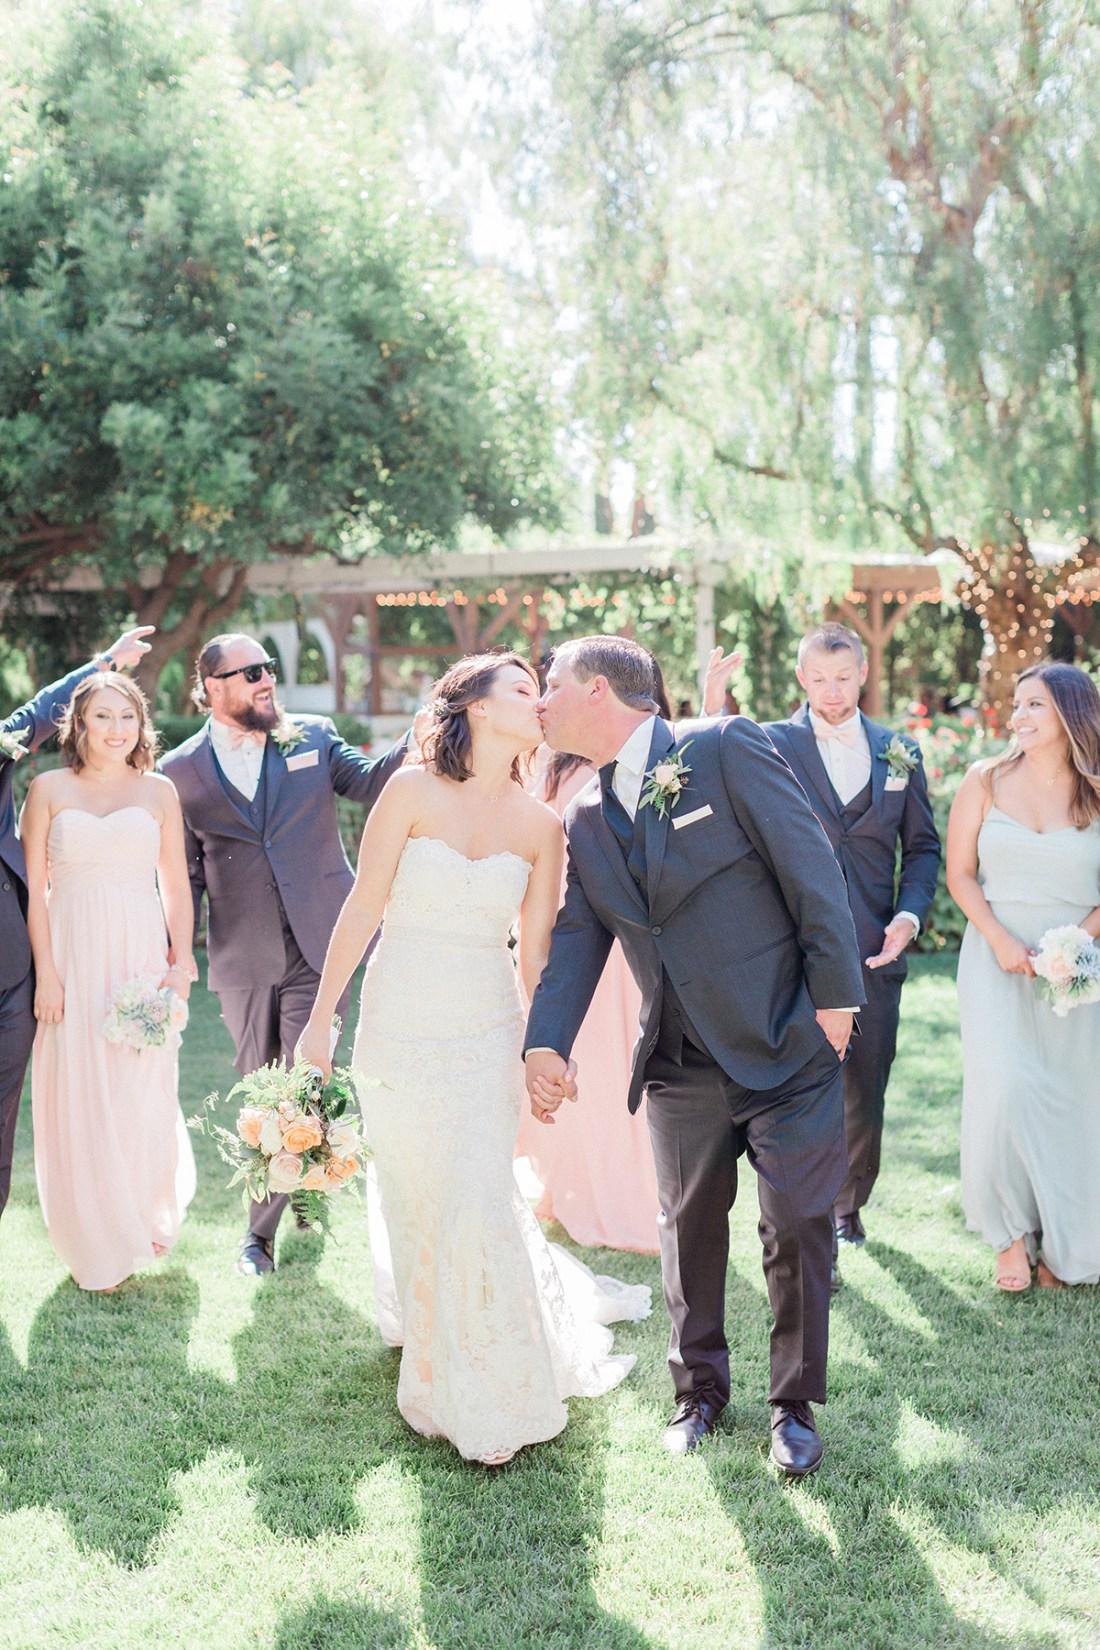 Amanda & Steve's Summer Wedding at Abbott Manor in Temecula, Calf. | A Good Hue